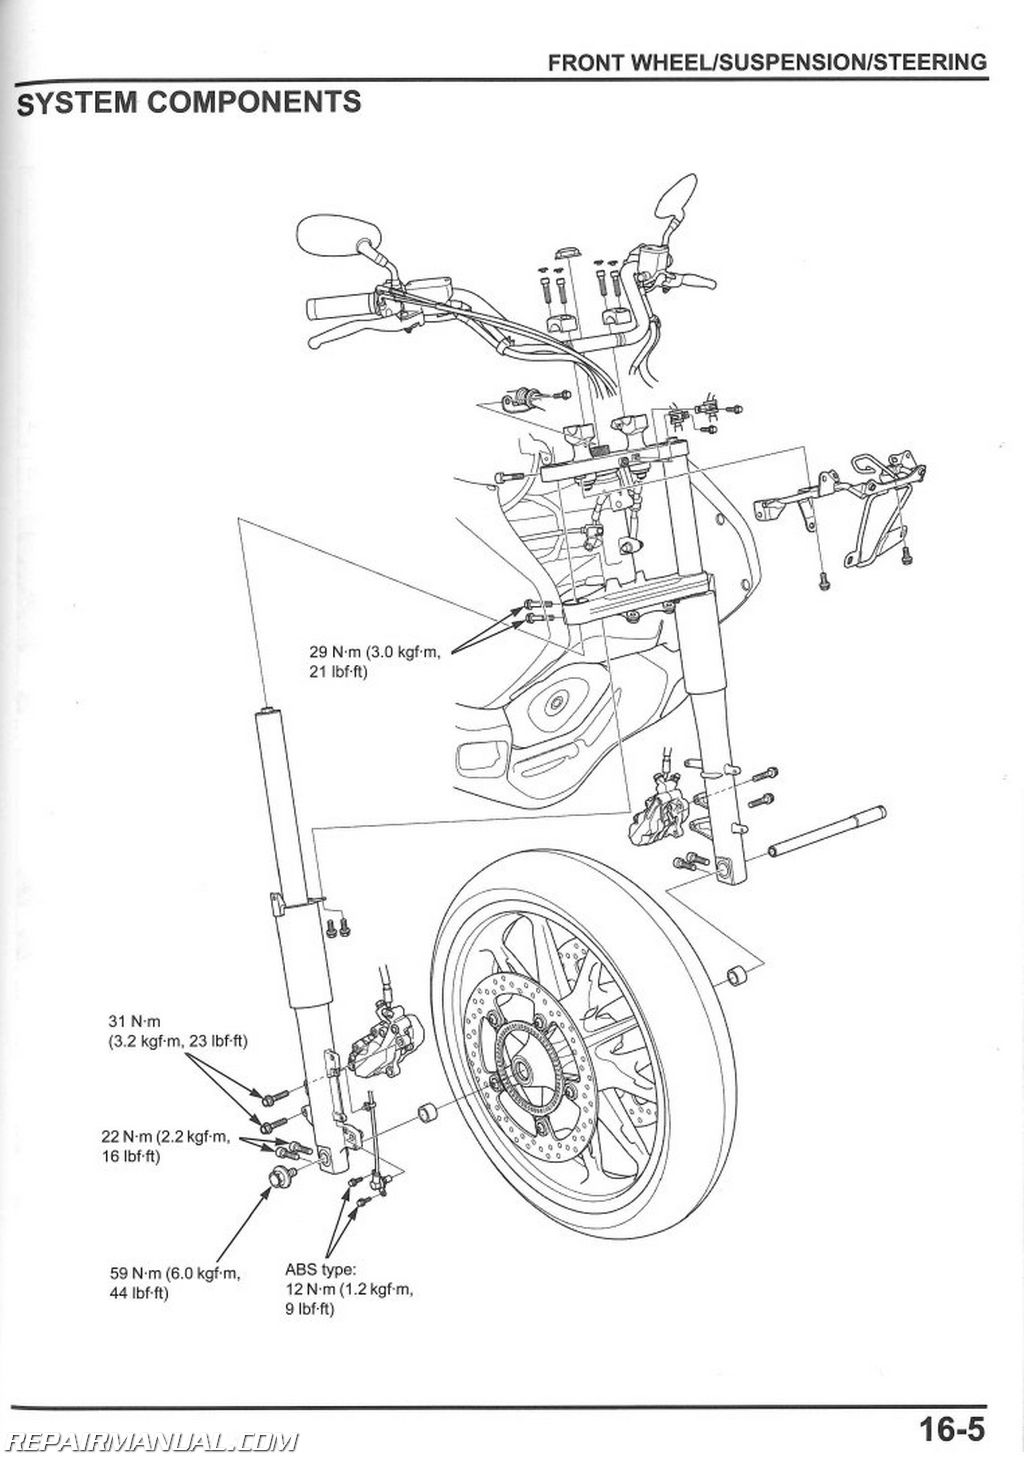 honda goldwing wiring diagram additionally 2014 honda goldwing 1800